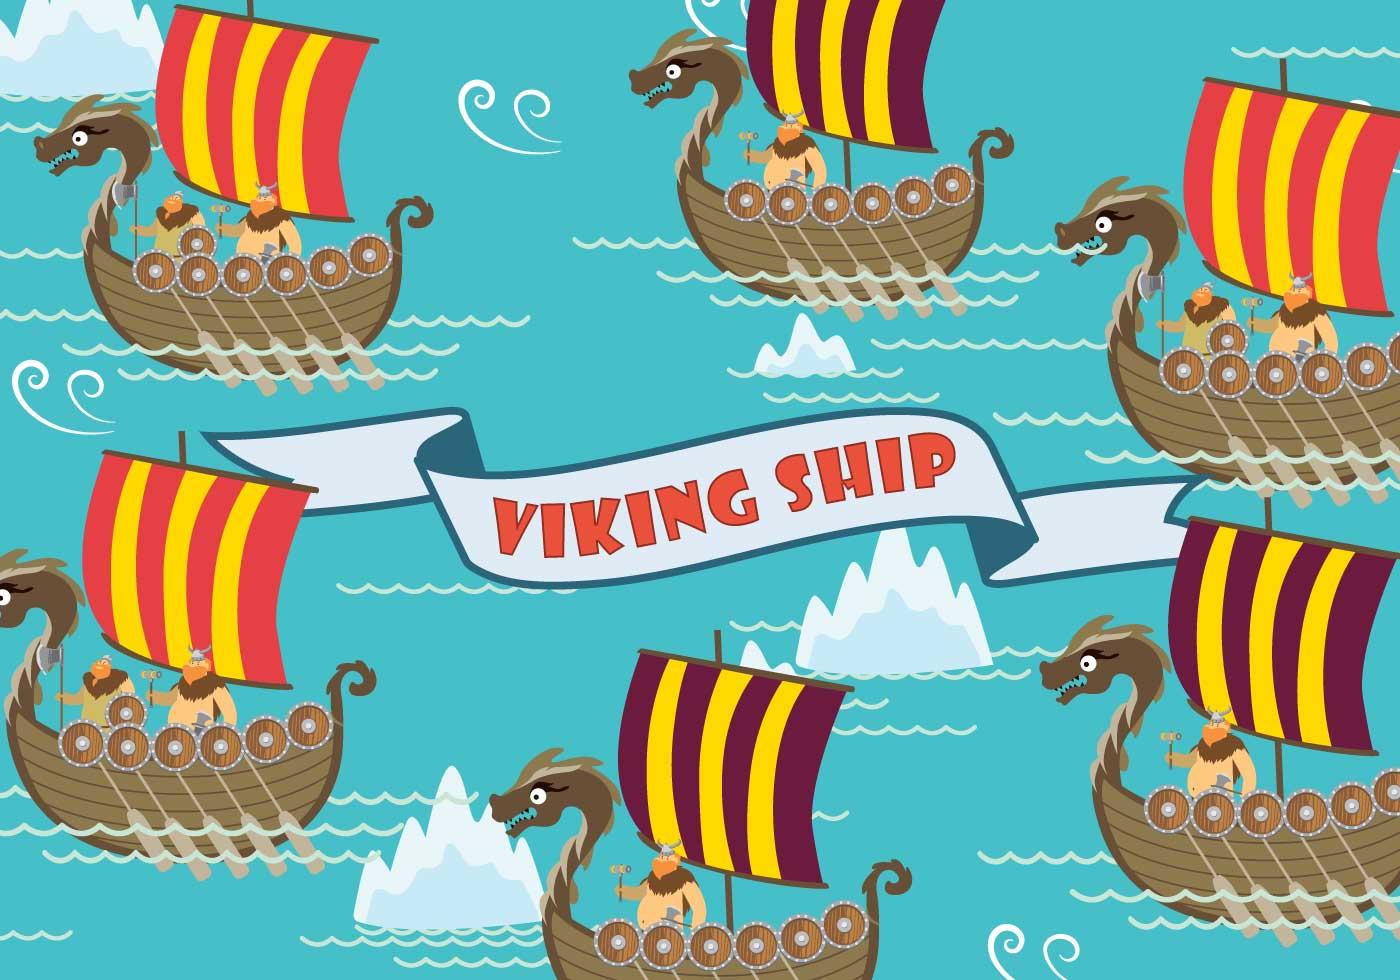 Free Viking Ship Illustration - Download Free Vectors ...